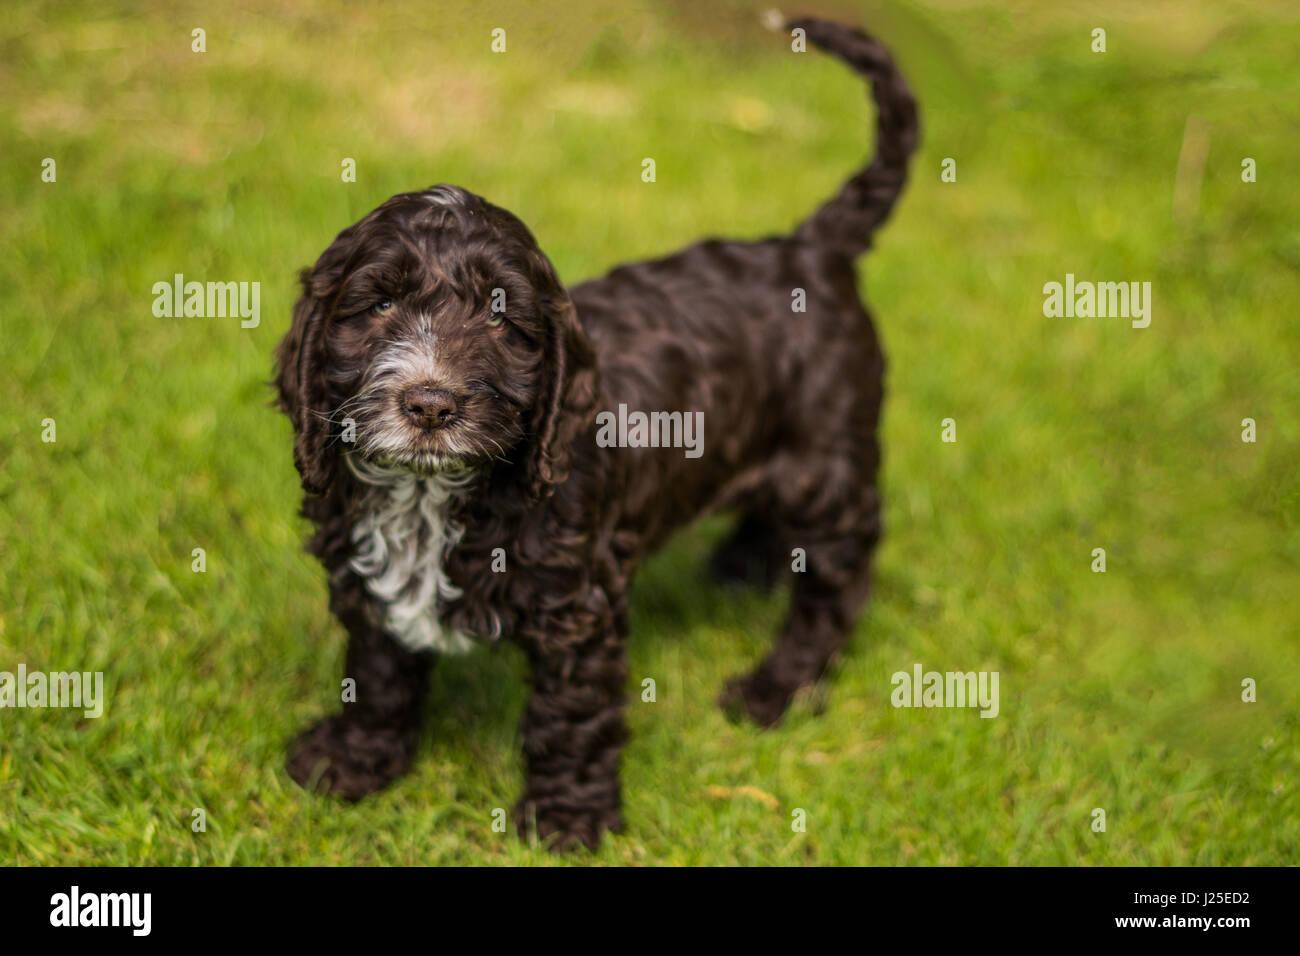 cockapoo dog puppy hound - Stock Image